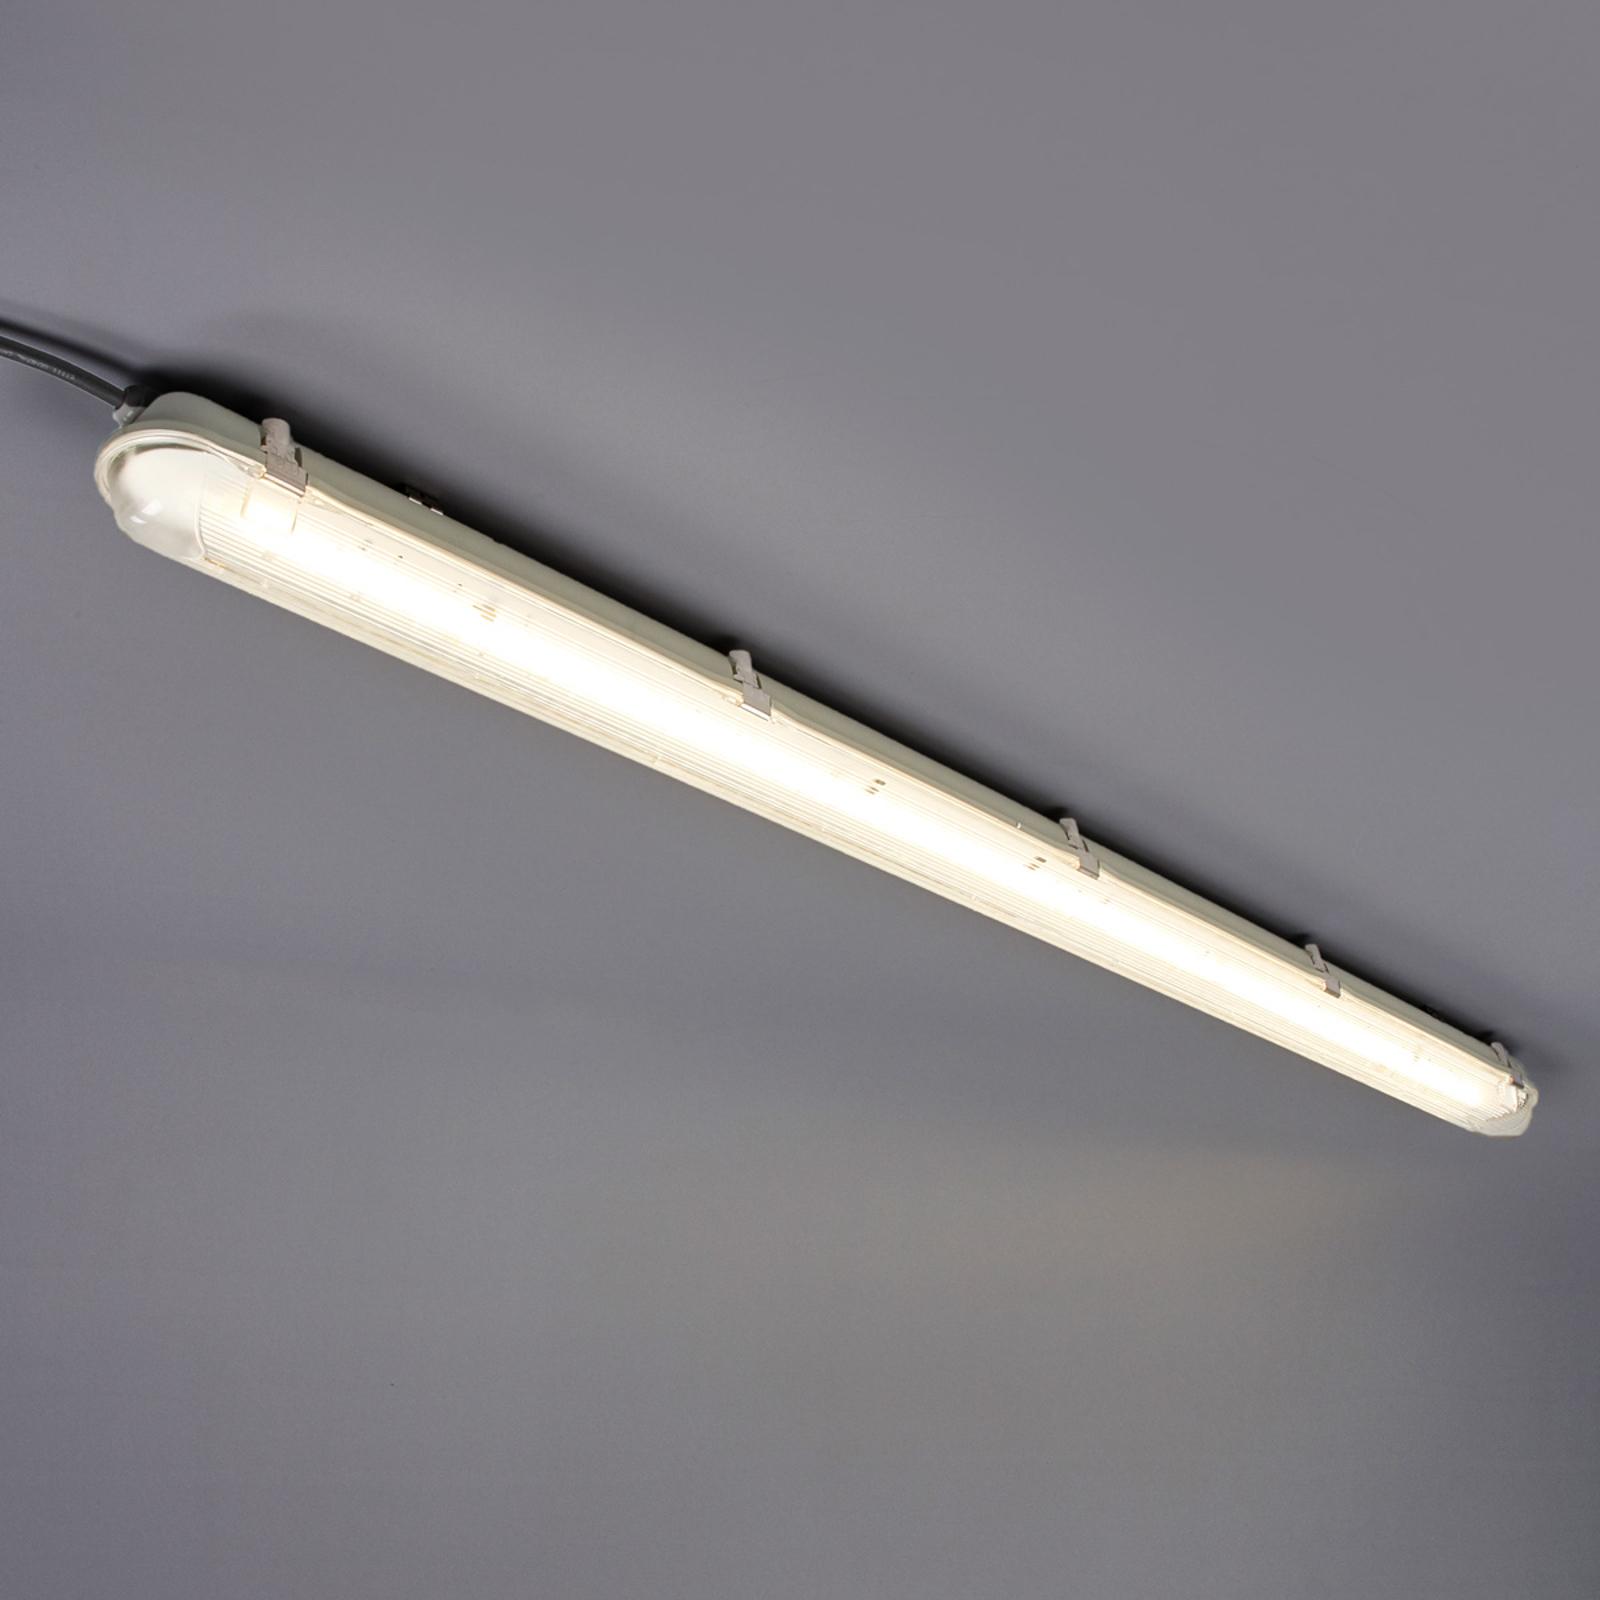 Moisture-proof LED wraparound light with IP65_3002155_1